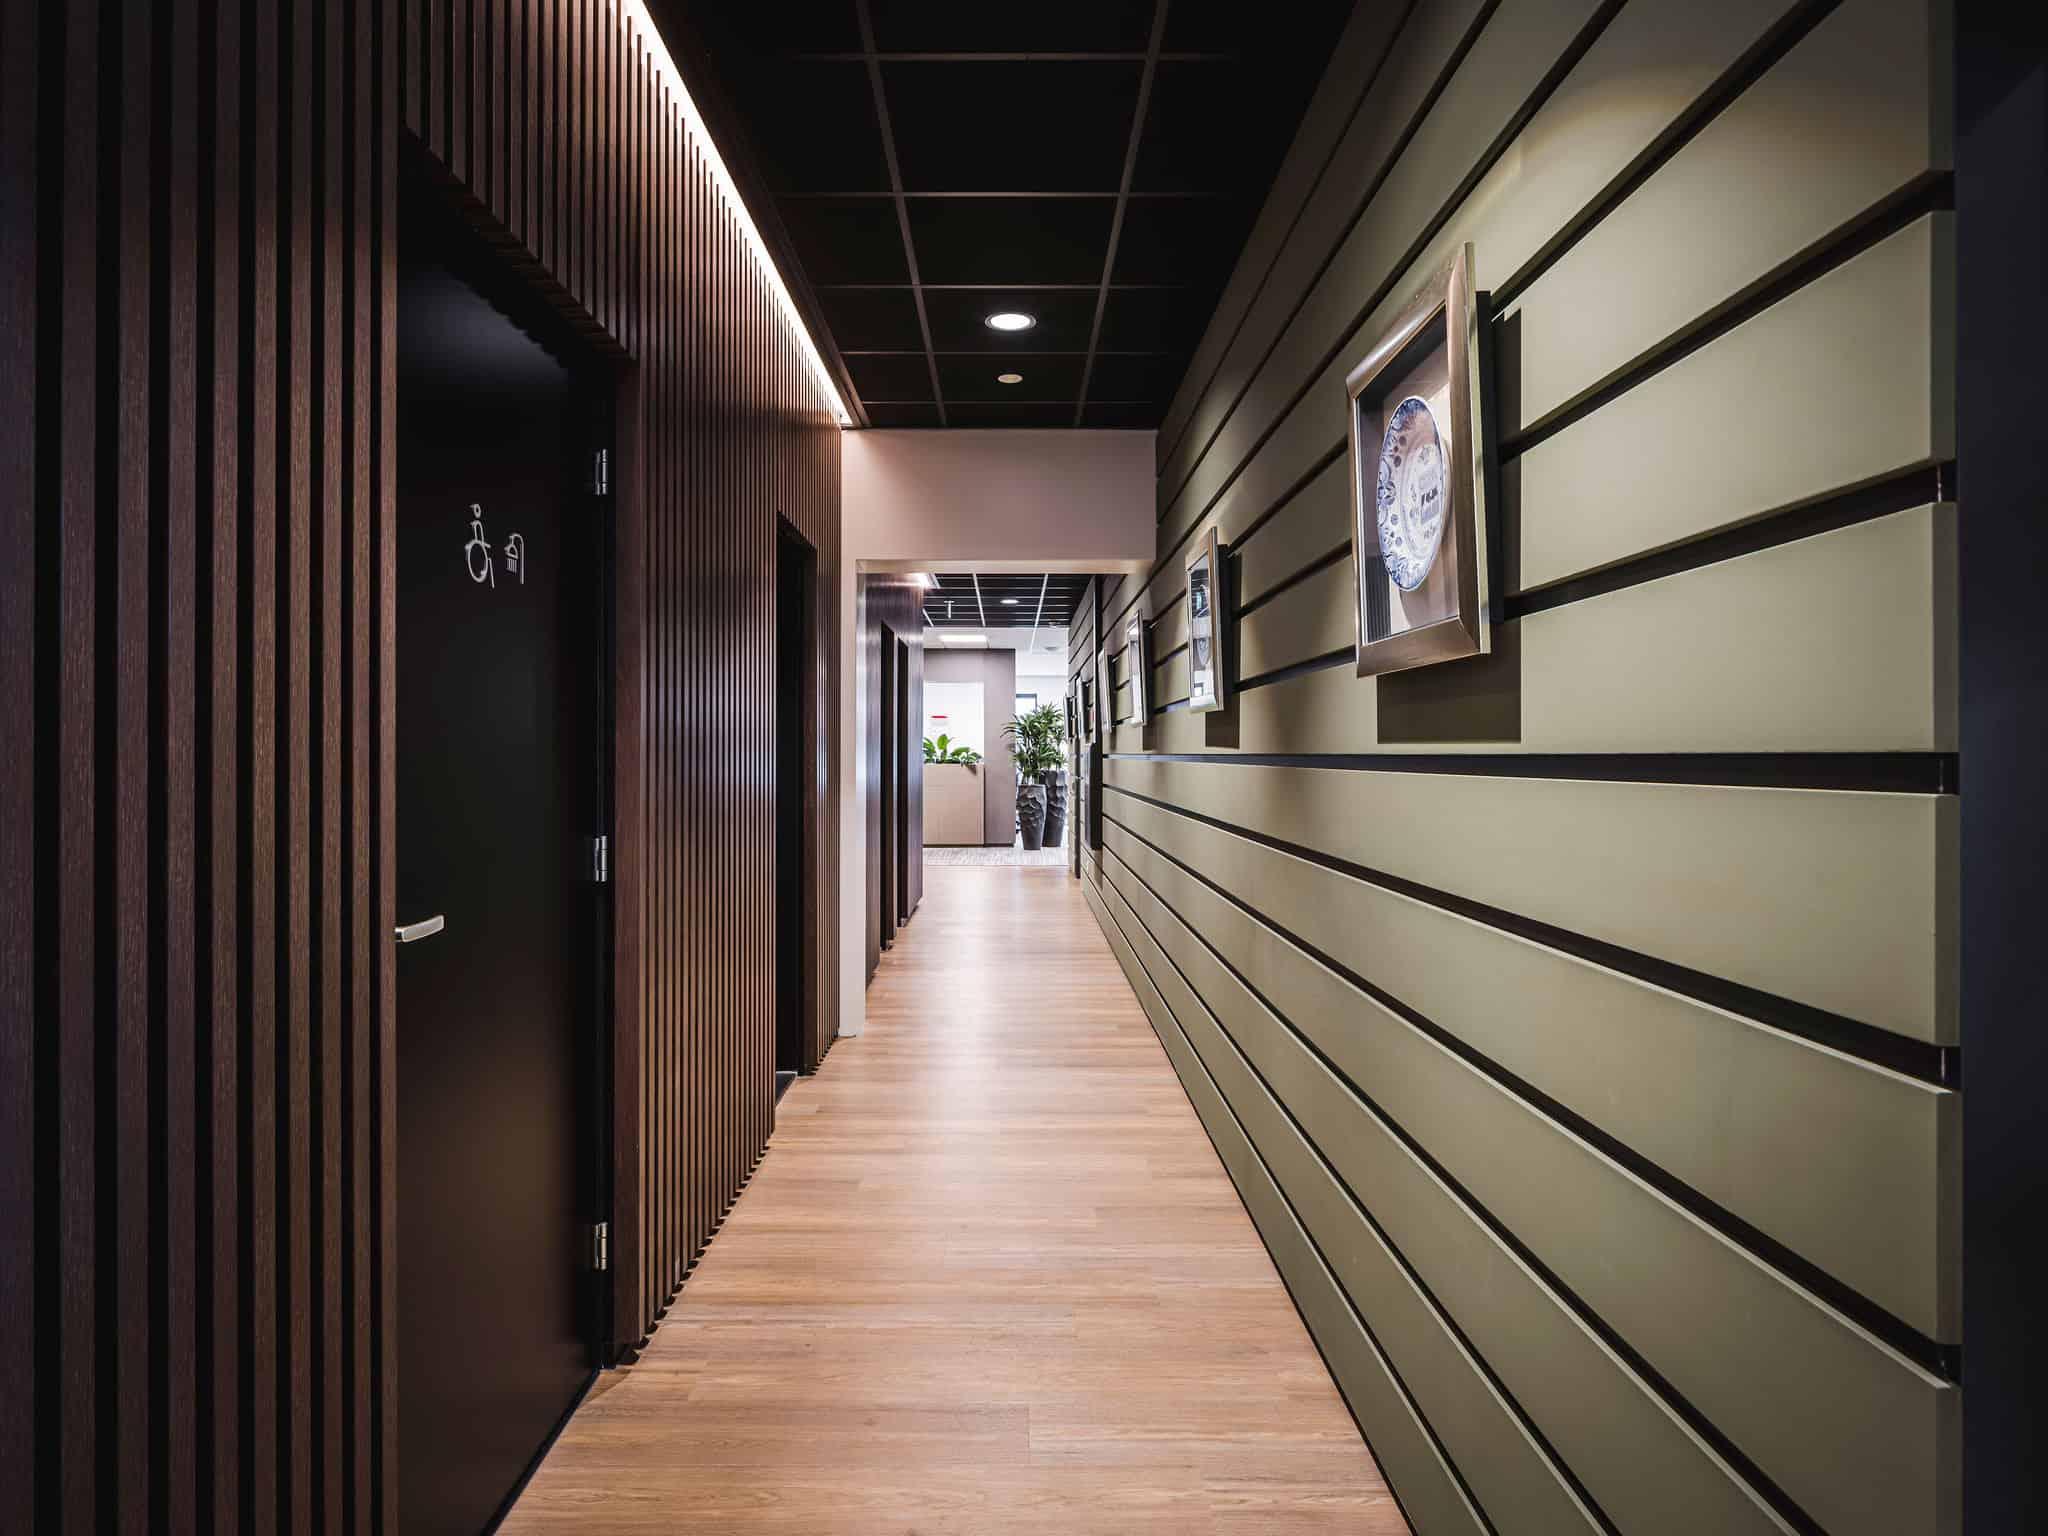 binnenhuisarchitect Wildenberg ontwerp COKZ verkeersruimte indirect licht fijri interieurbouw